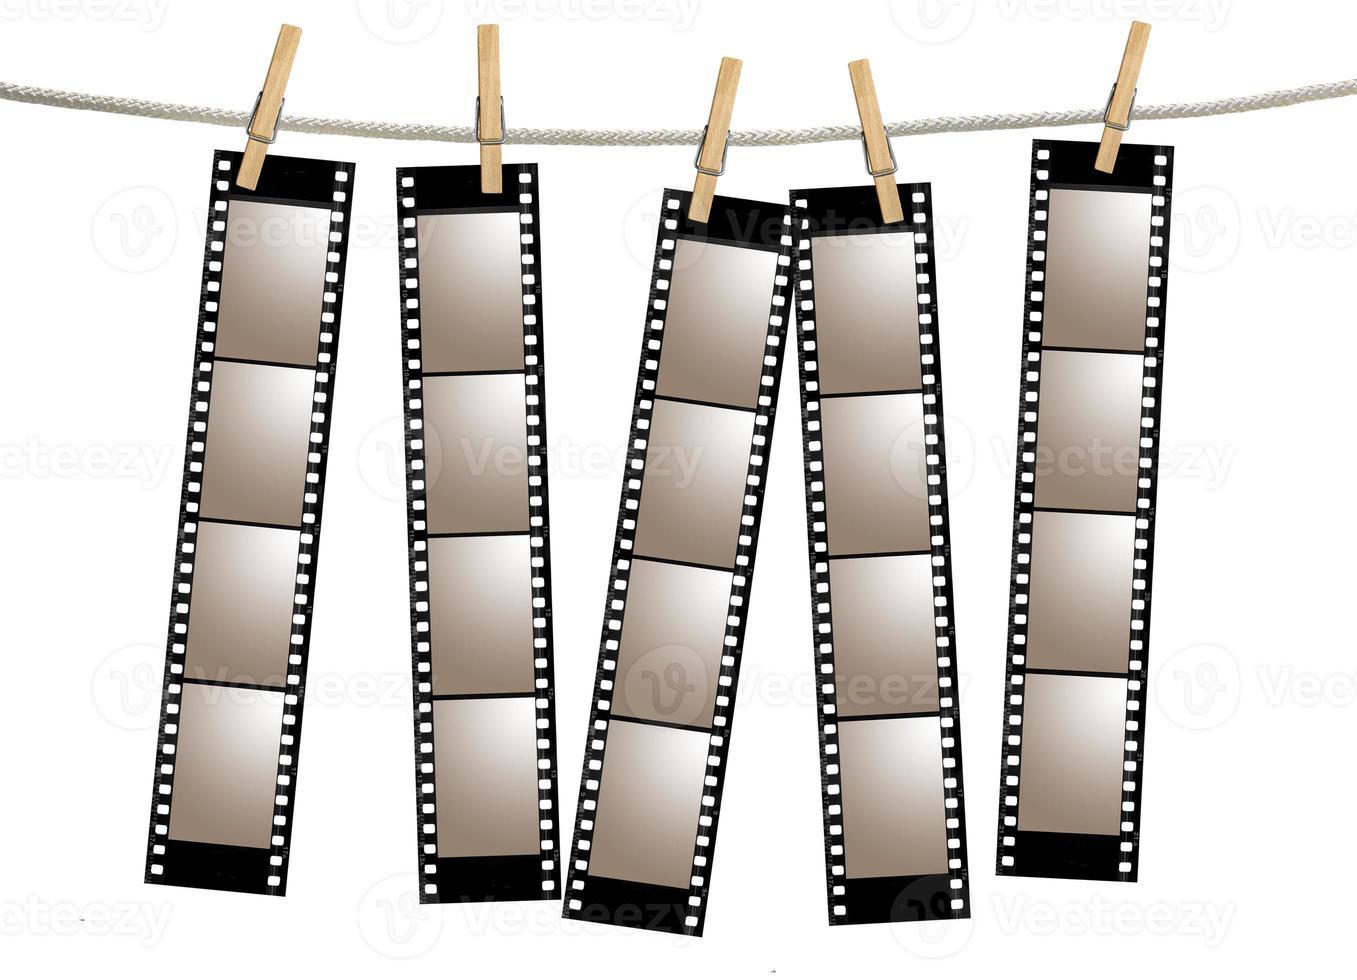 gamla film negativa filmremsor foto